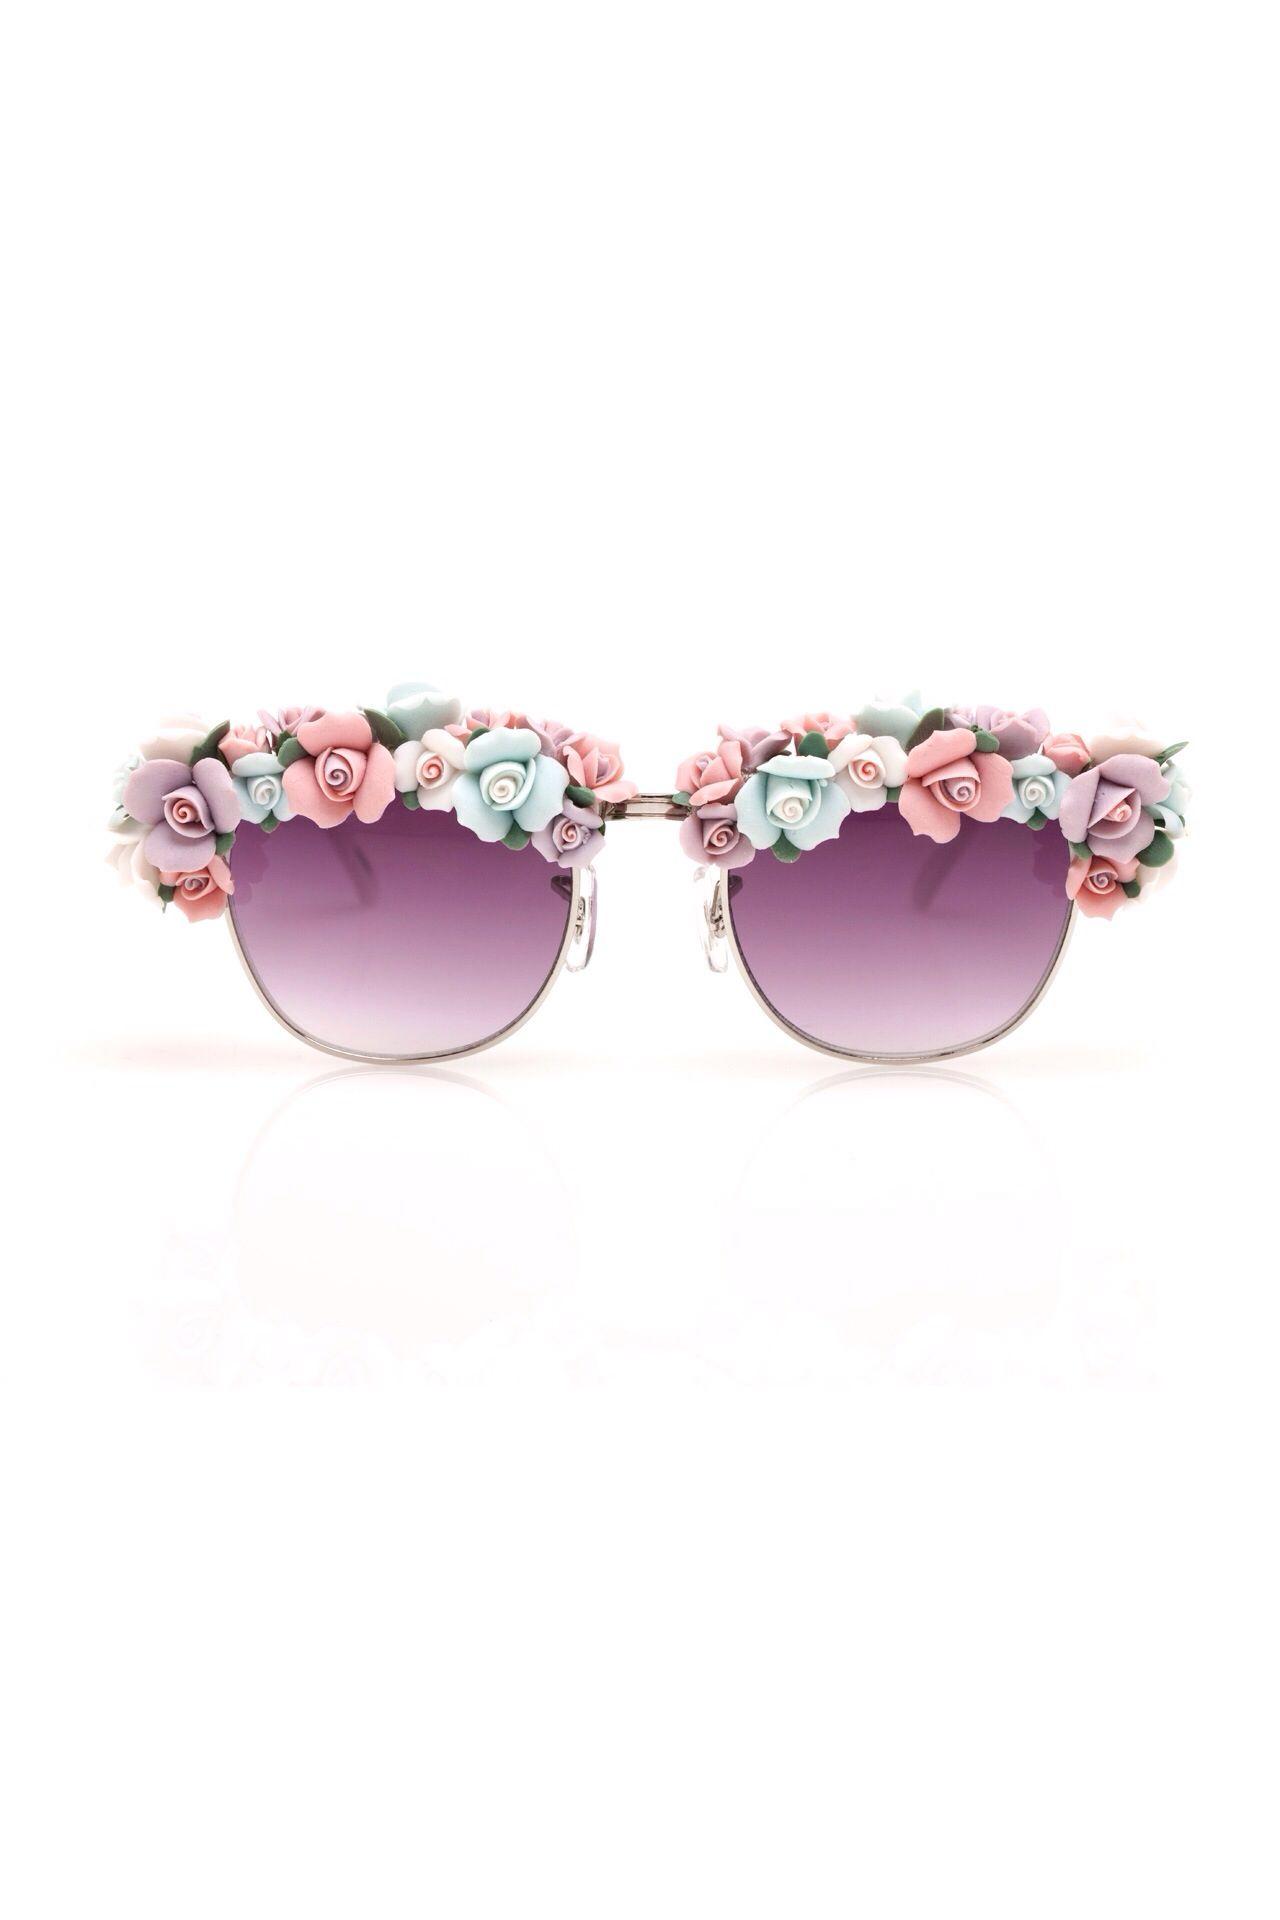 Óculos De Sol De Verão, Óculos, Sunnies, Tiaras, Designer De Bolsas Baratas 05ba2106de